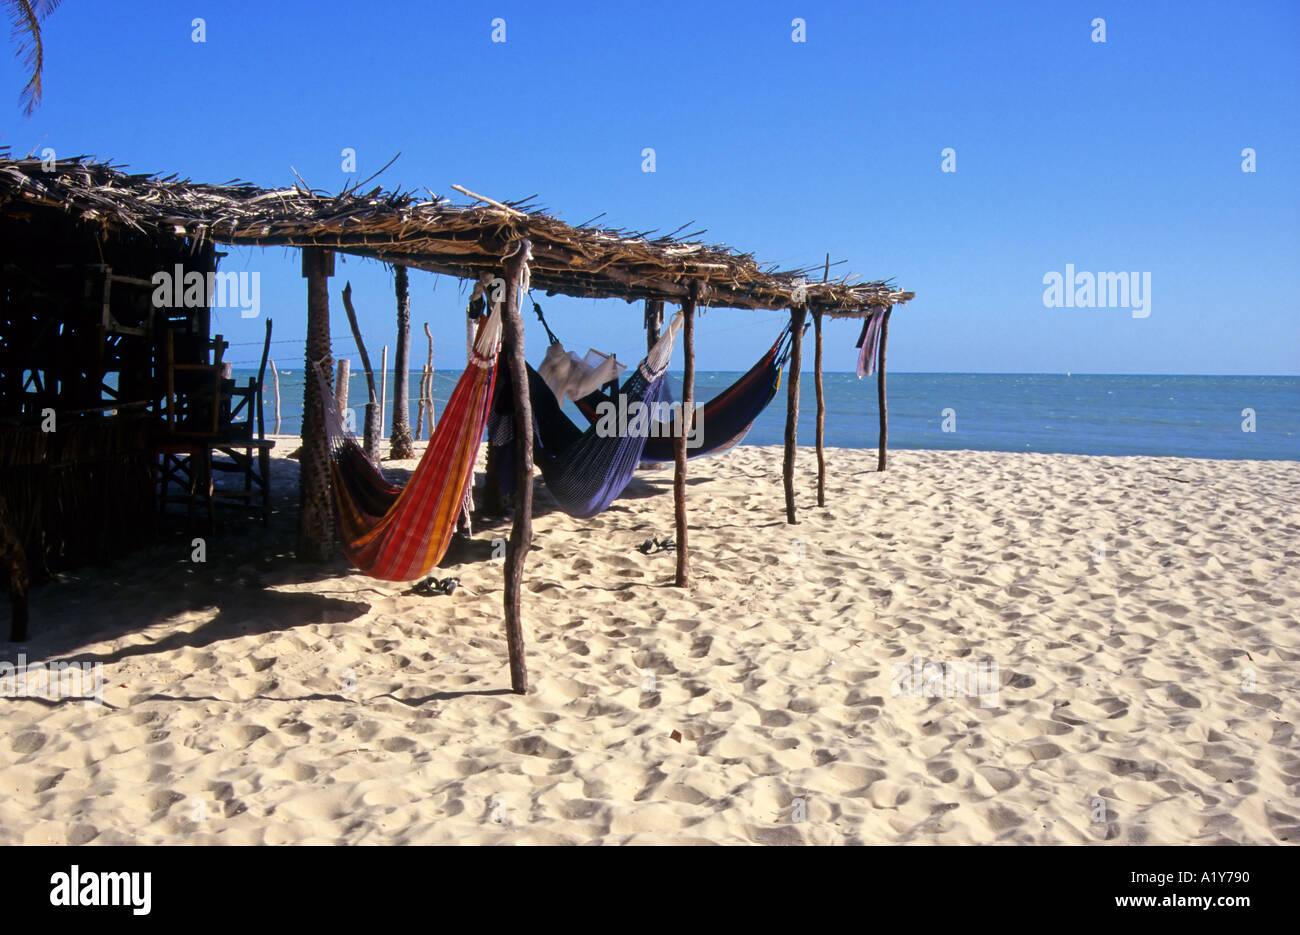 Hammocks on the beach - Hammocks On The Beach Pecem North East Brazil